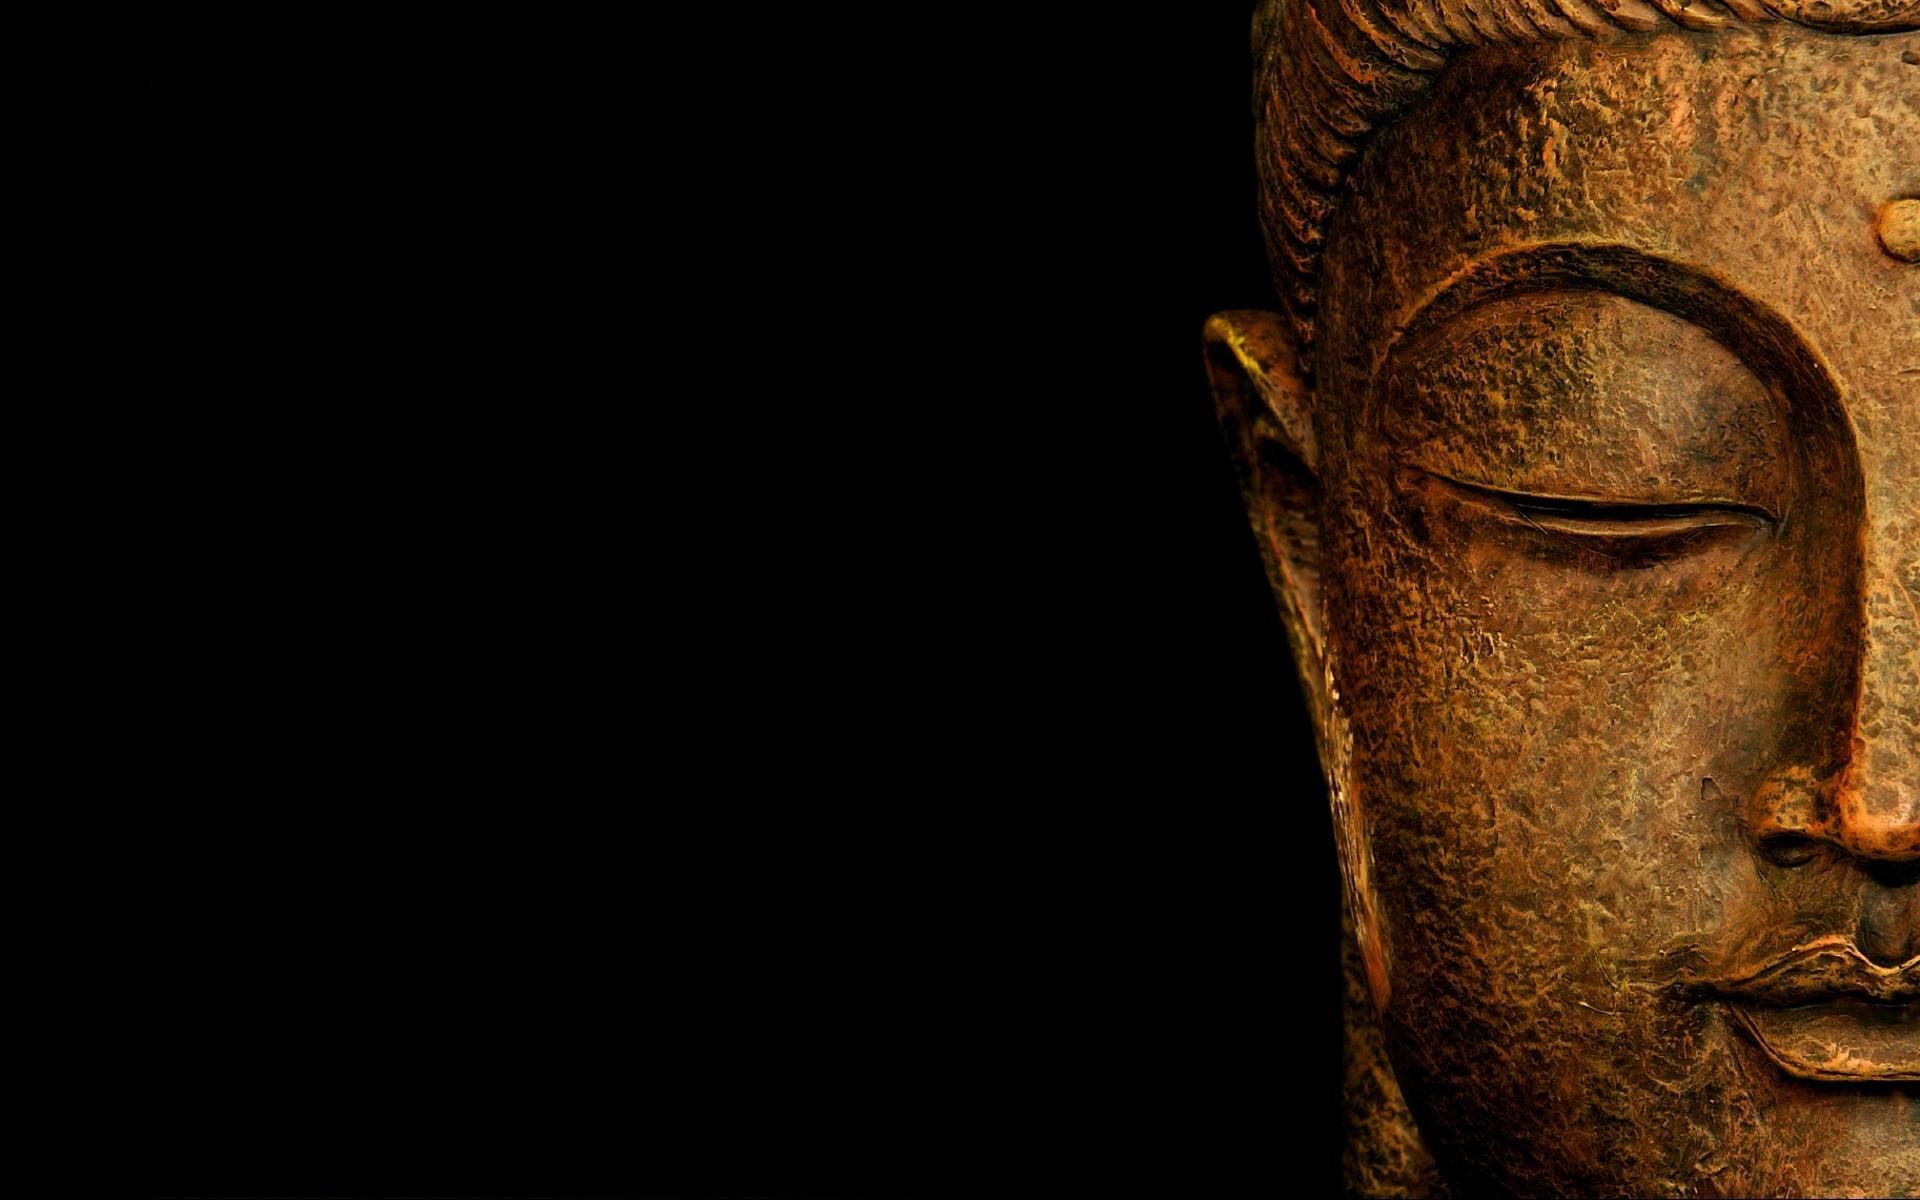 Best 25 Wall Hd Ideas On Pinterest: Buddhist Wallpaper ·①